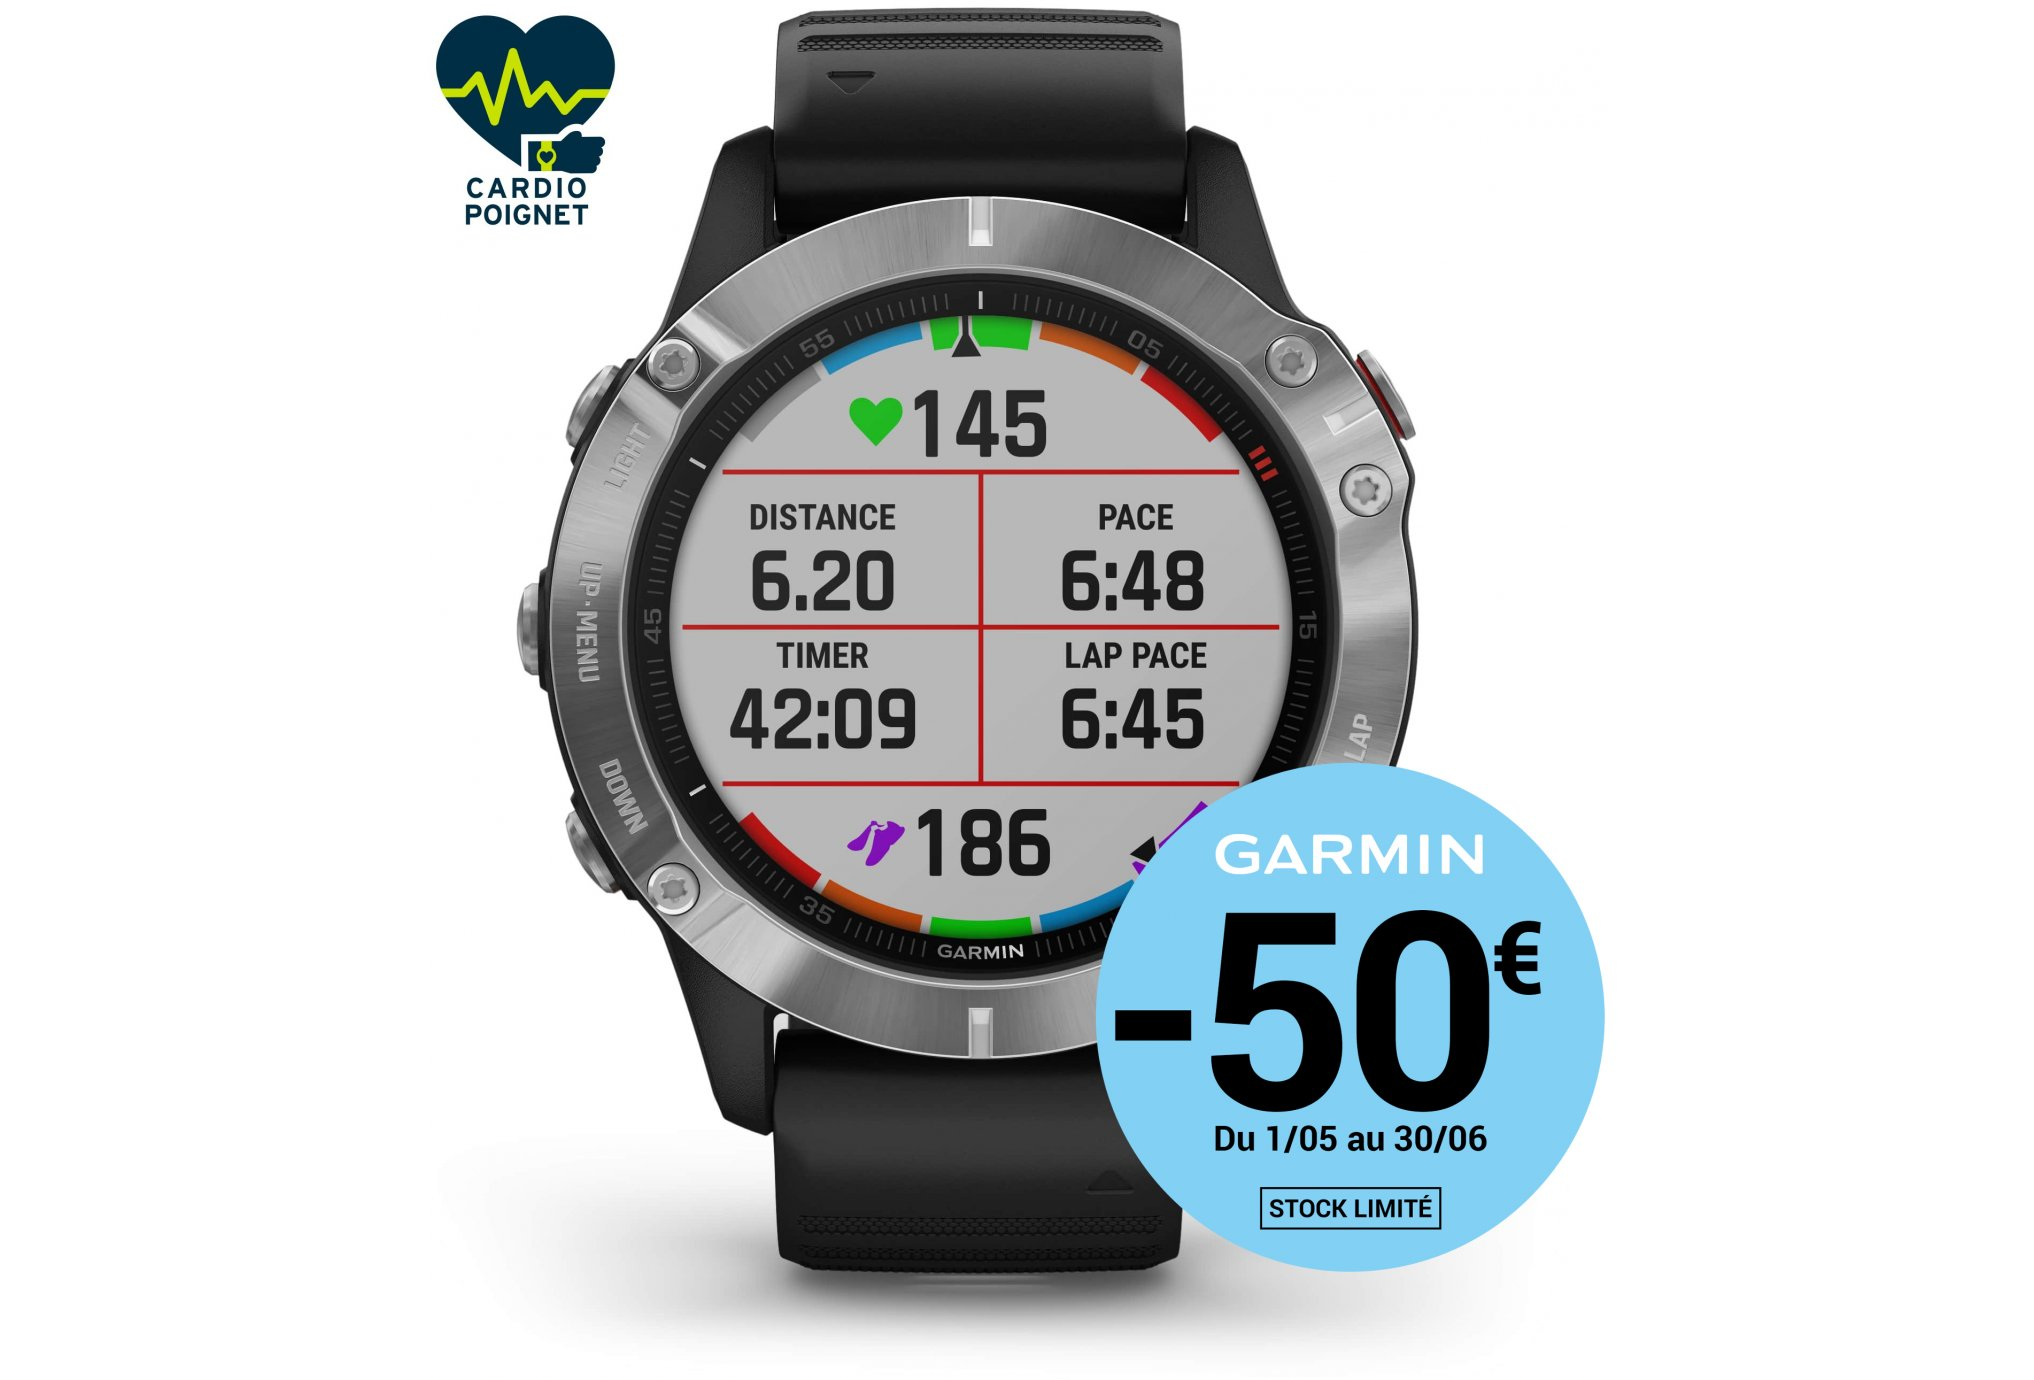 Garmin Fenix 6 Cardio-Gps